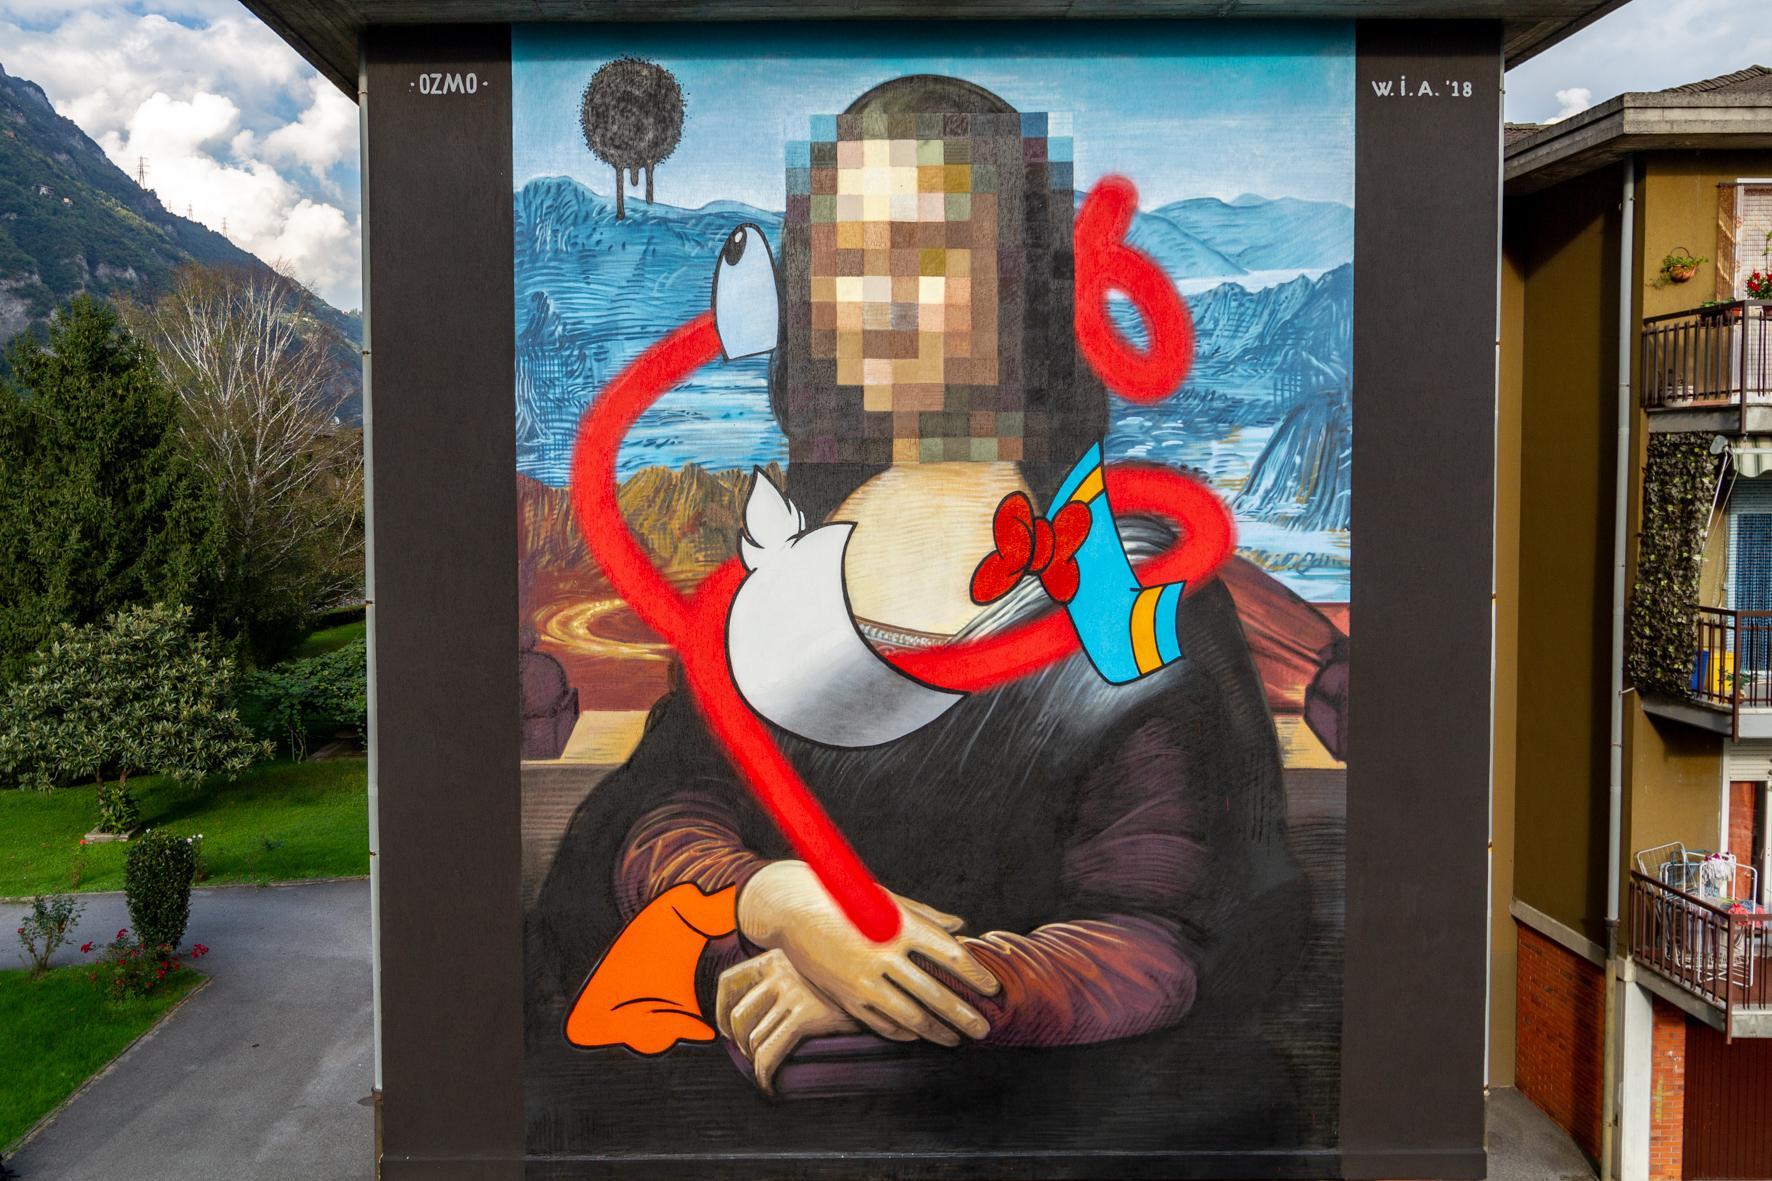 Ozmo street art wall in art Angone Darfo Boario Terme